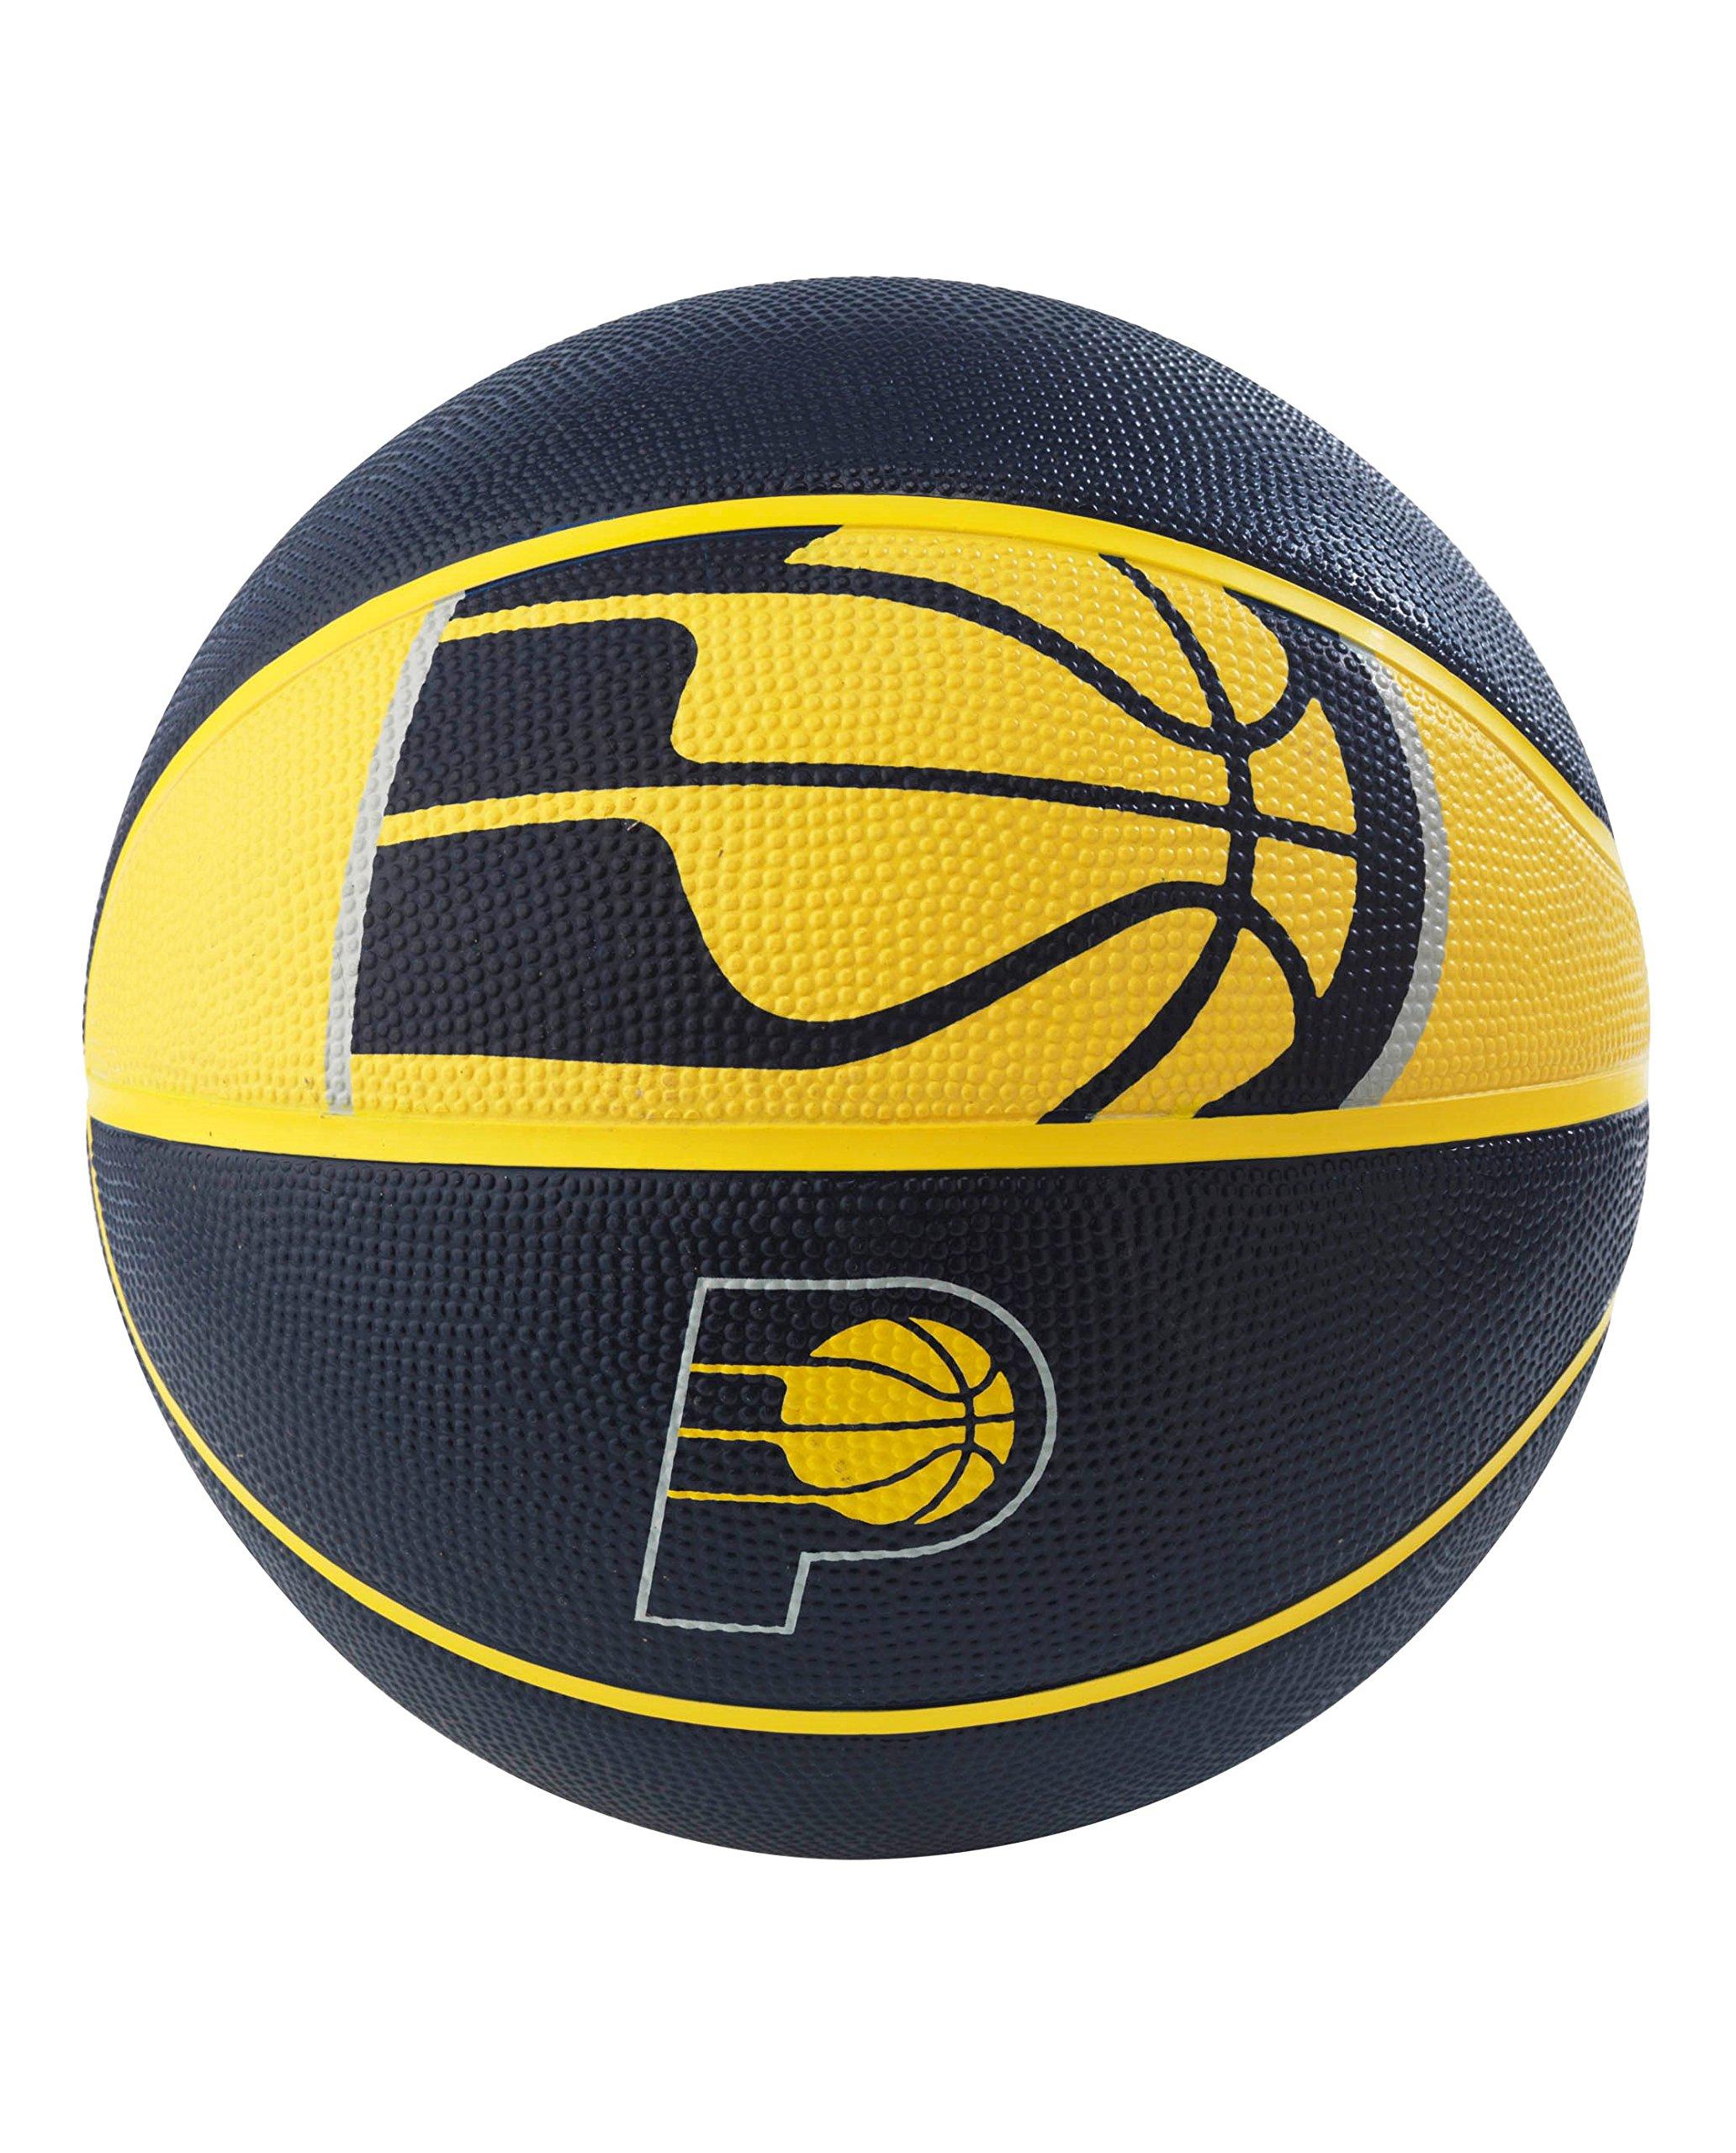 Spalding NBA Indiana Pacers NBA Courtside Team Outdoor Rubber Basketballteam Logo, Navy, 29.5''